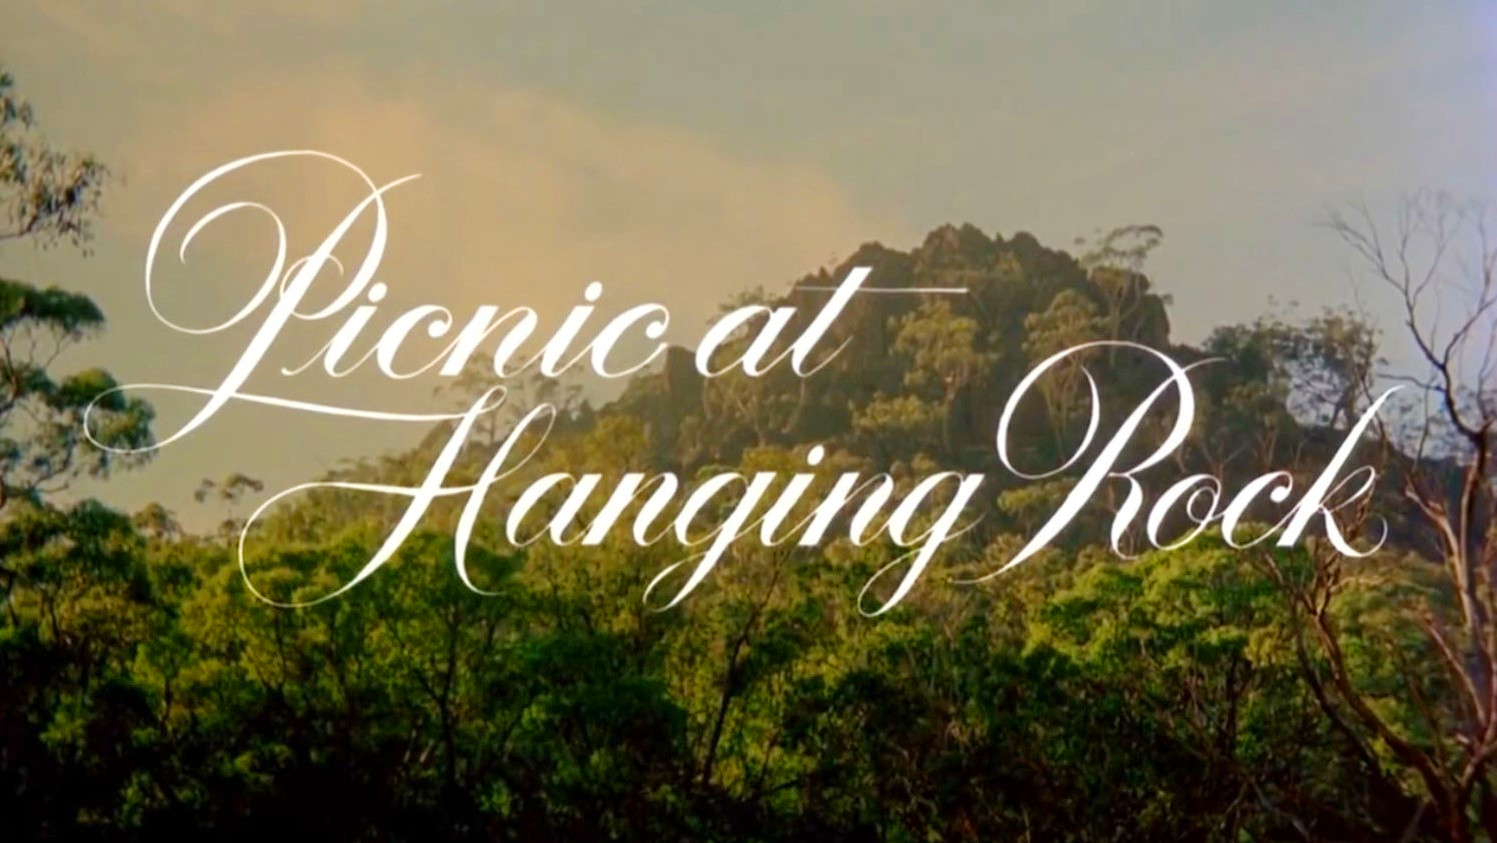 Picnic Hanging Rock Peter Weir Dreams  Le Cinema